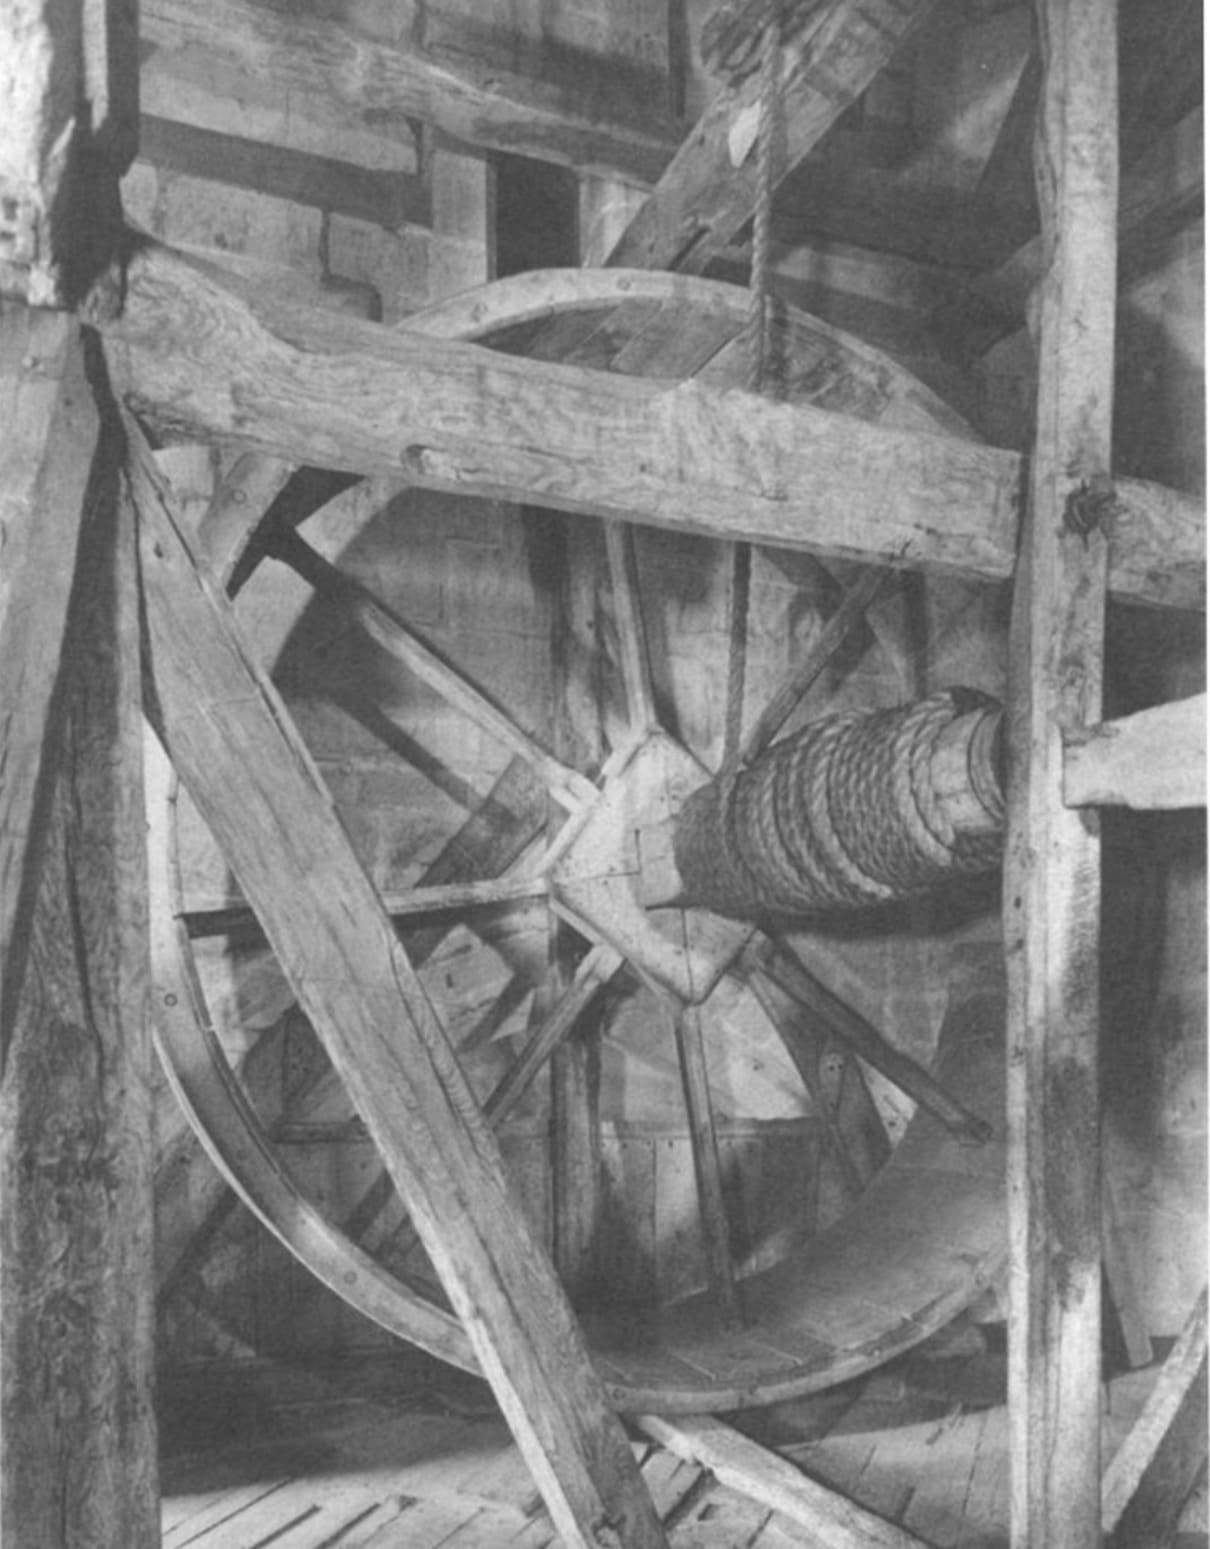 Treadwheel crane on Salisbury Cathedral